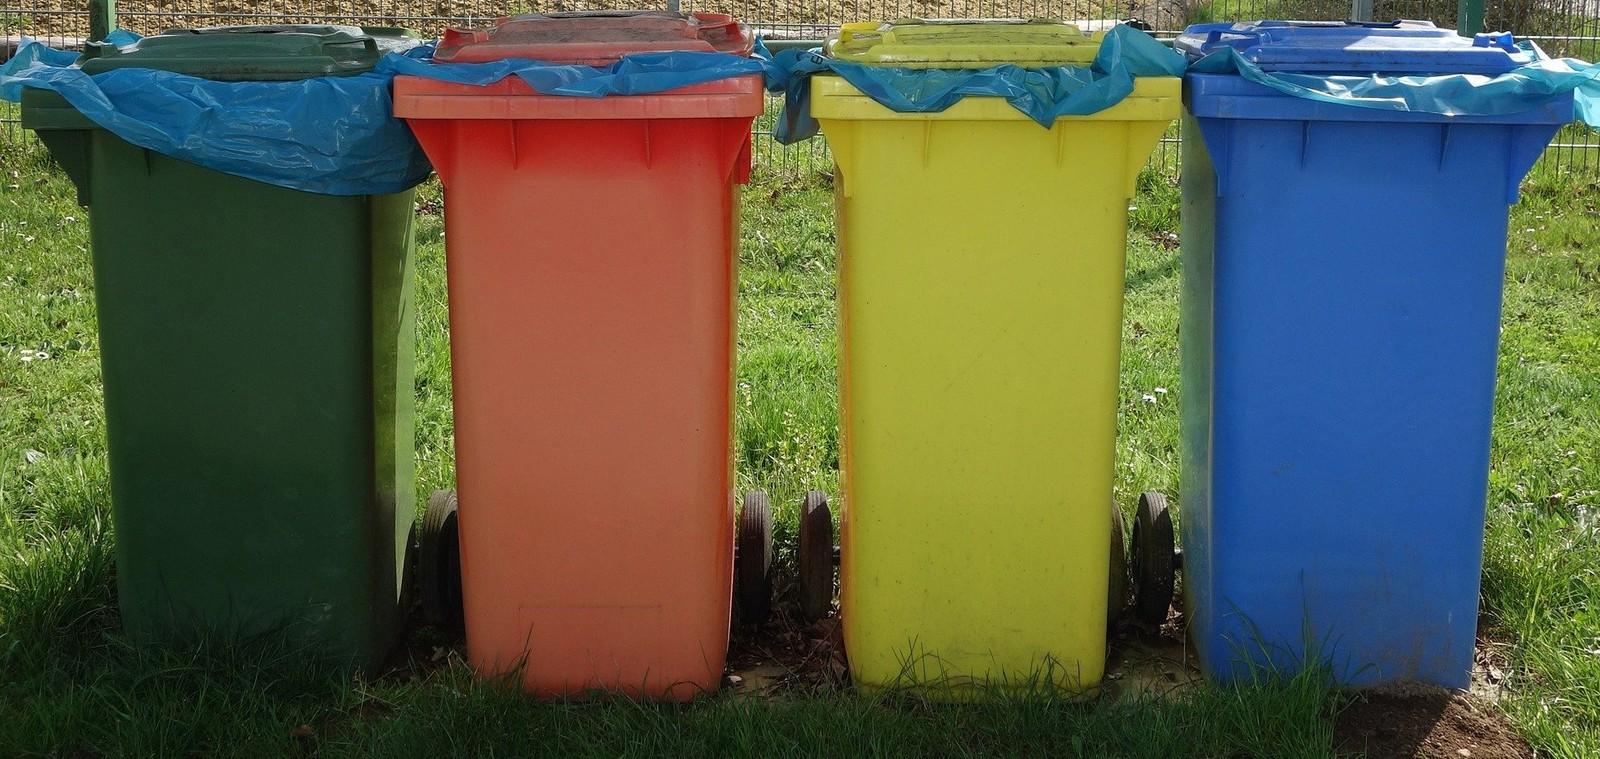 waste-separation-502952_1920.jpeg